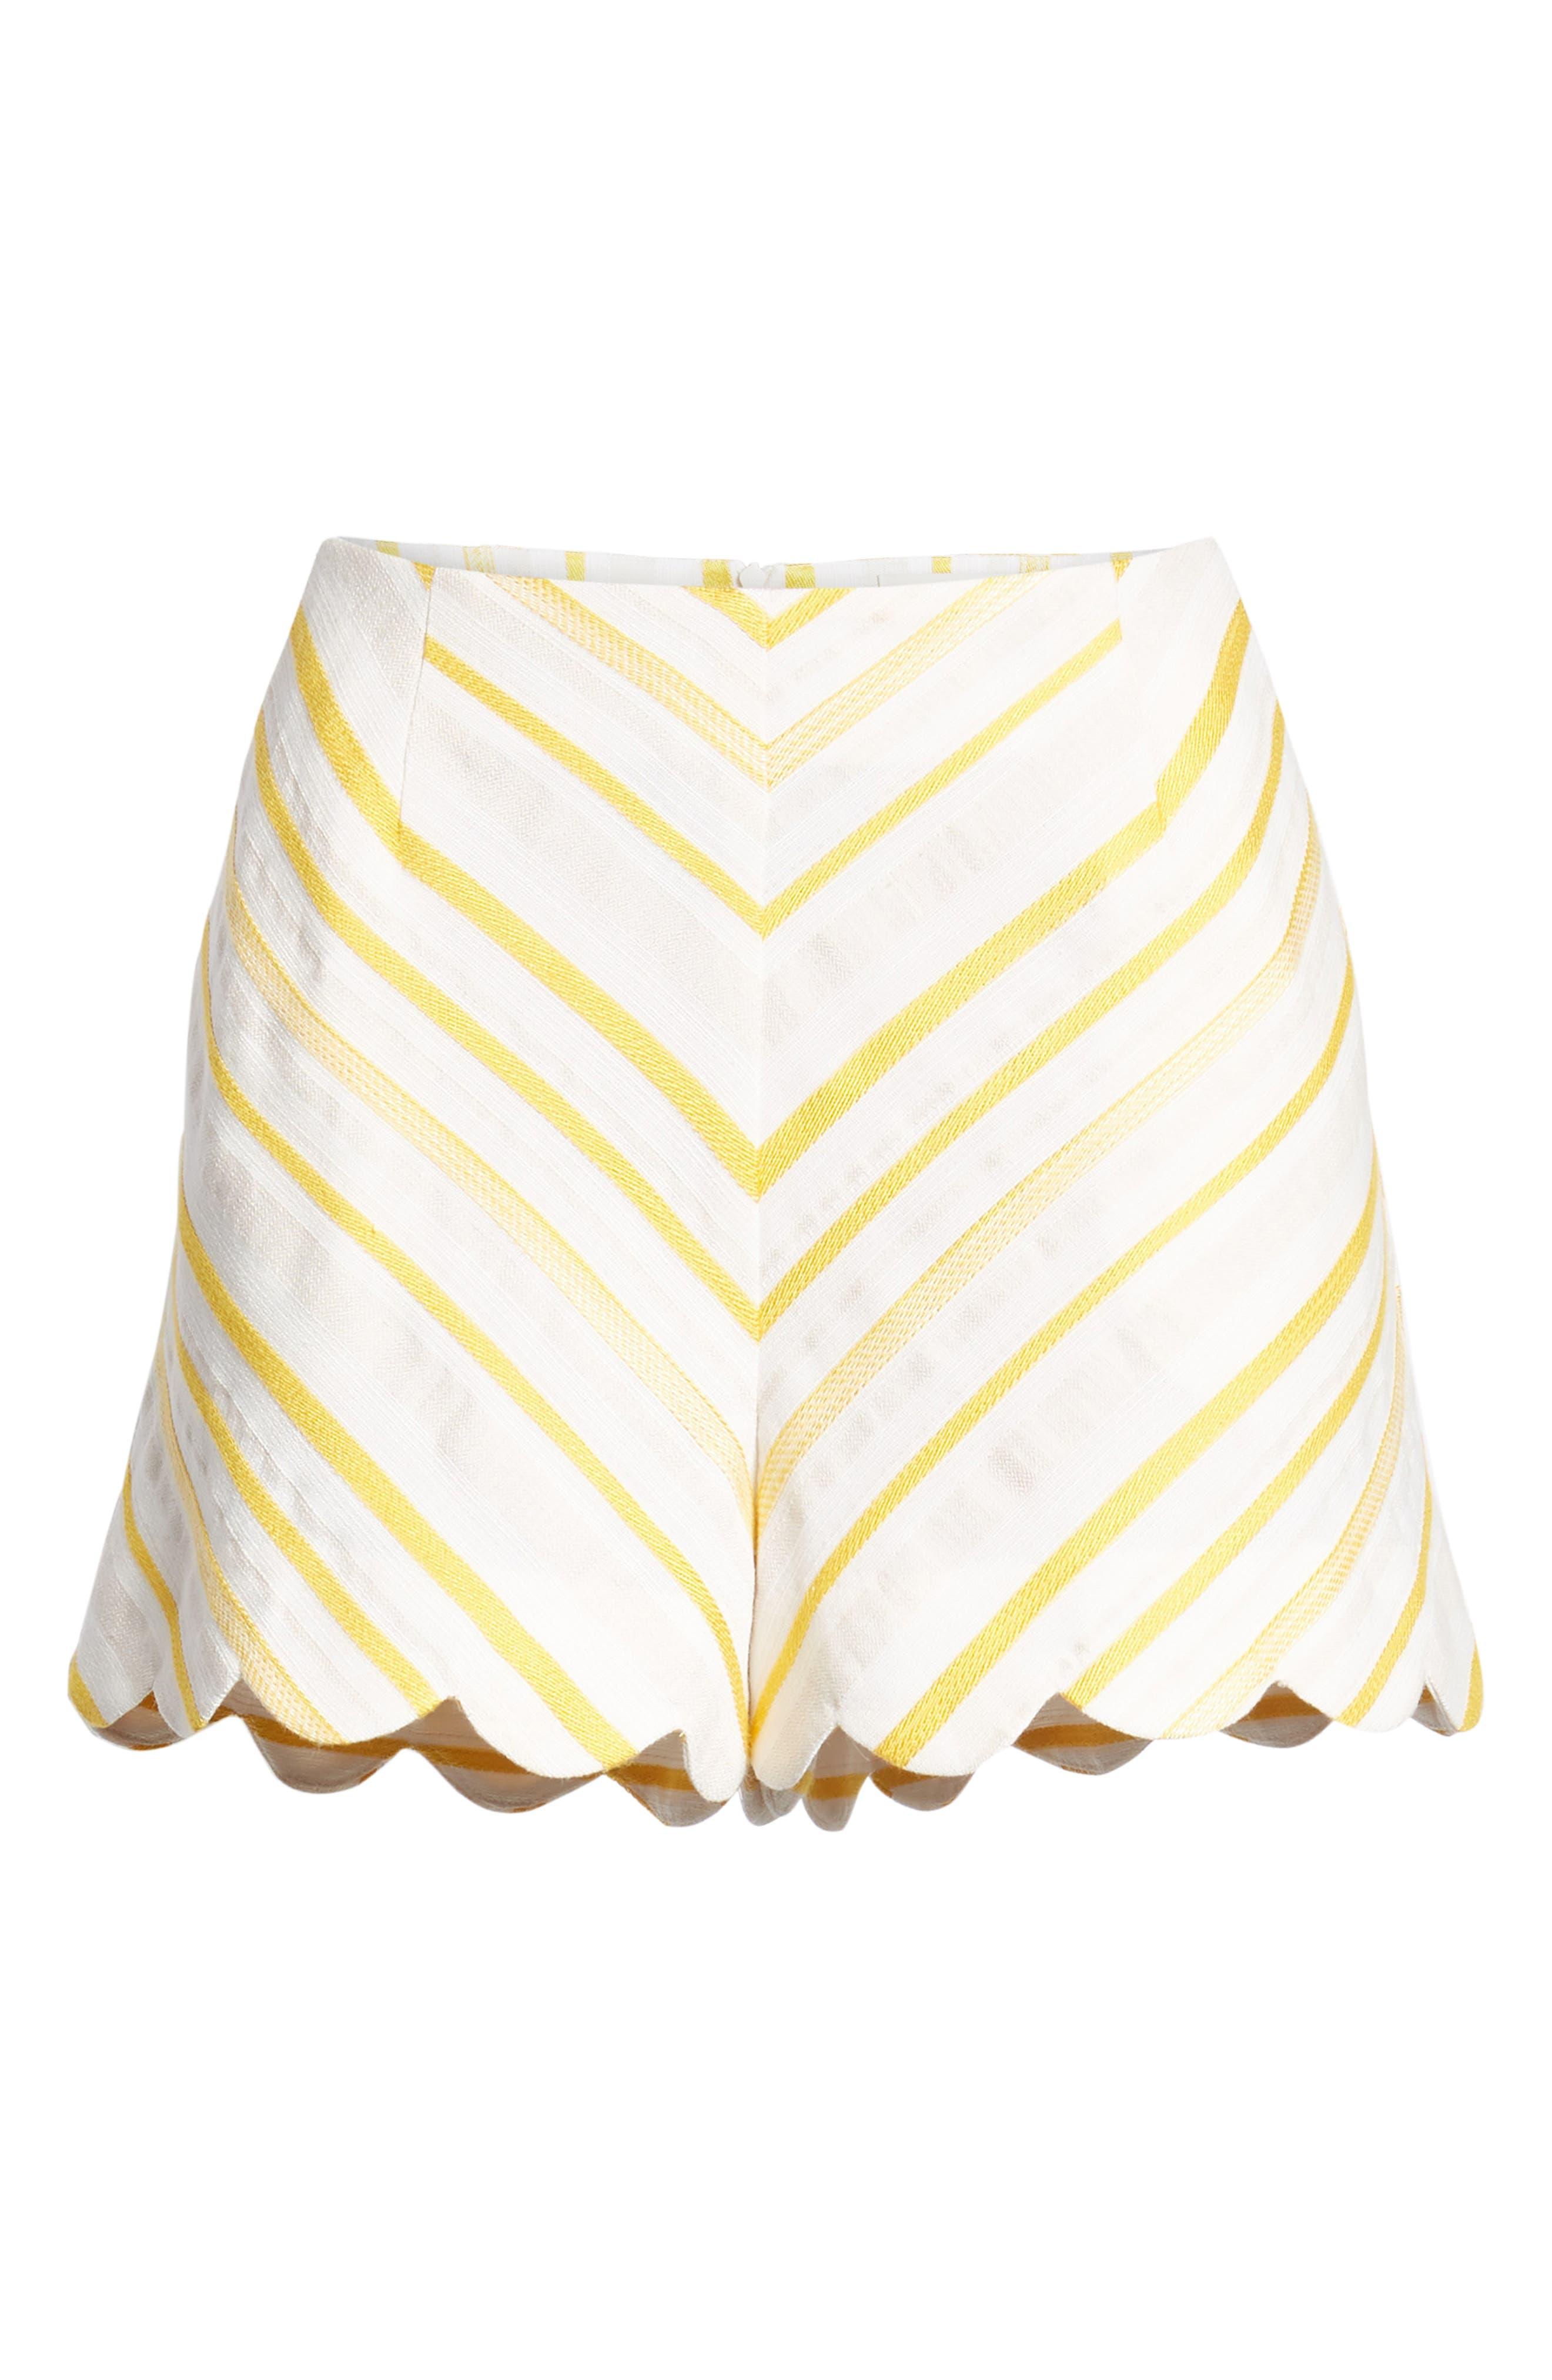 Scallop Shorts,                             Alternate thumbnail 6, color,                             Cream Yellow